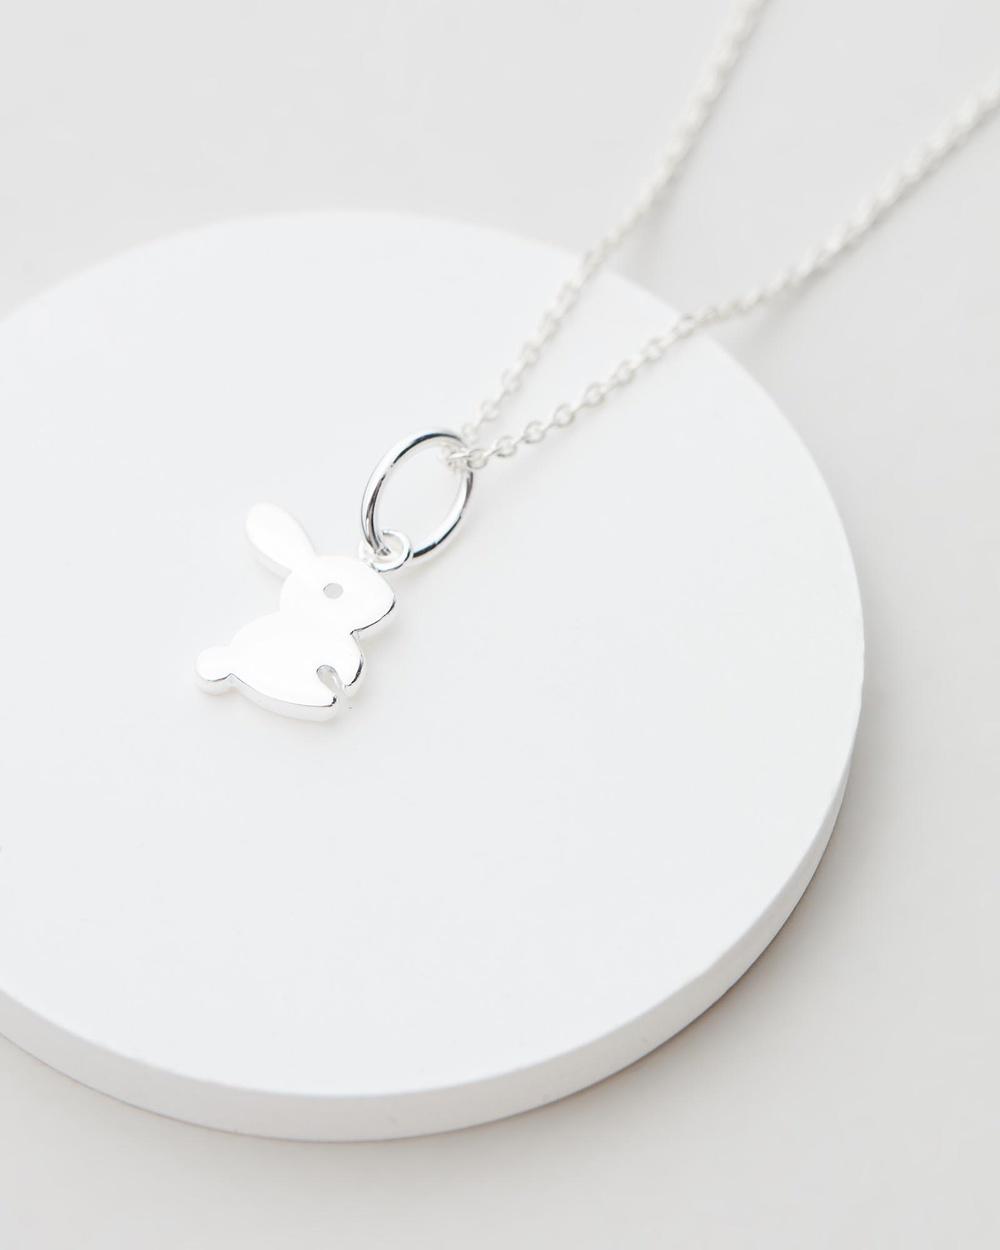 My Little Silver Fluffy Bunny Pendant & Necklace Kids Jewellery Sterling Silver